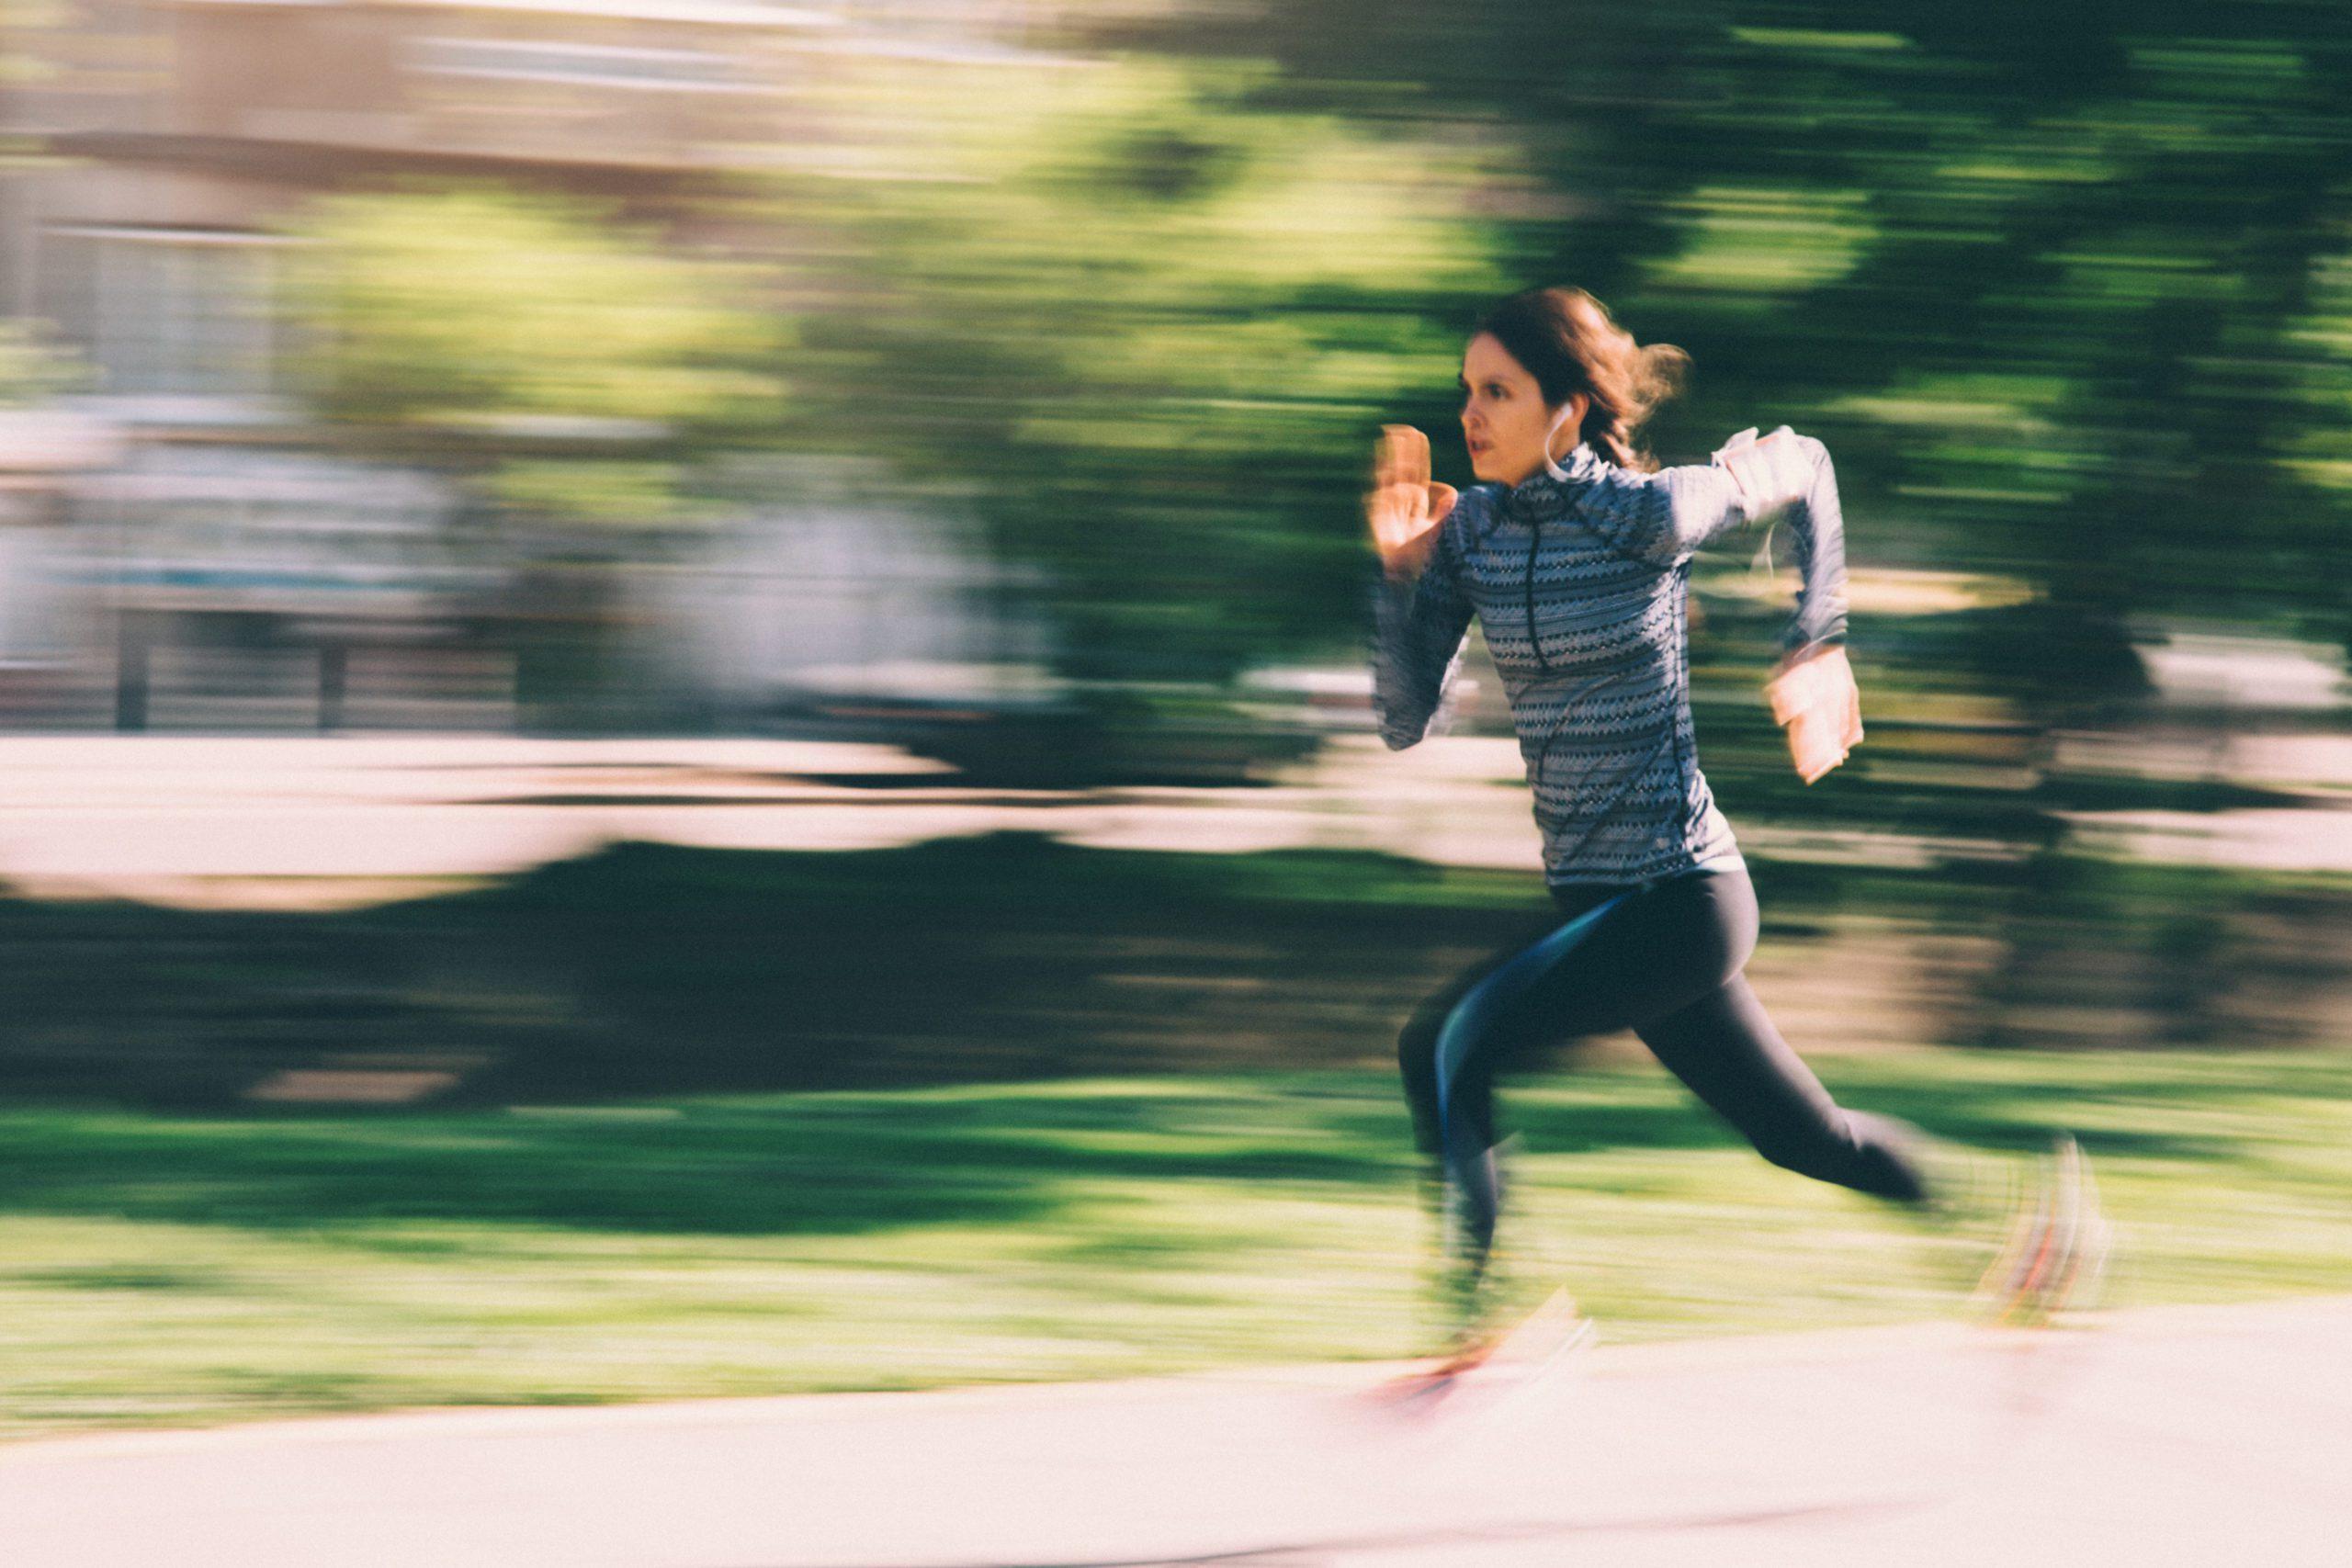 Pasfrequentie hardlopen | Running Solutions